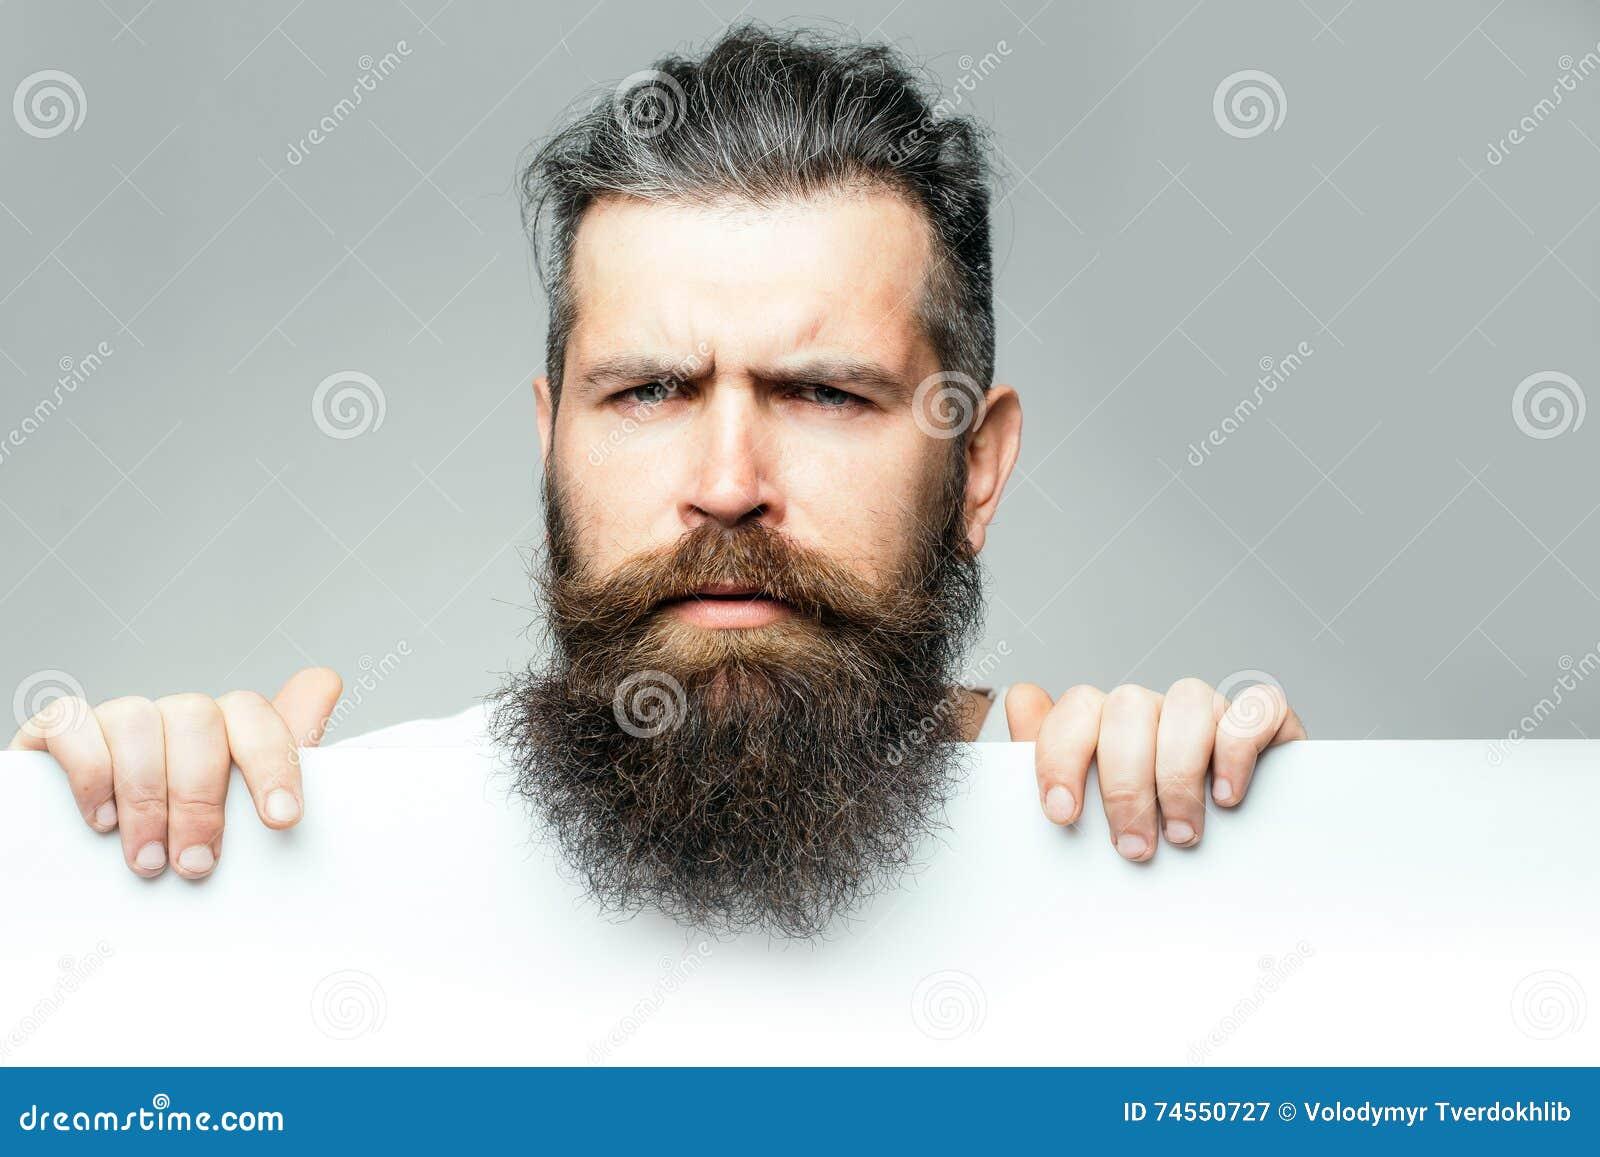 angery white man essay